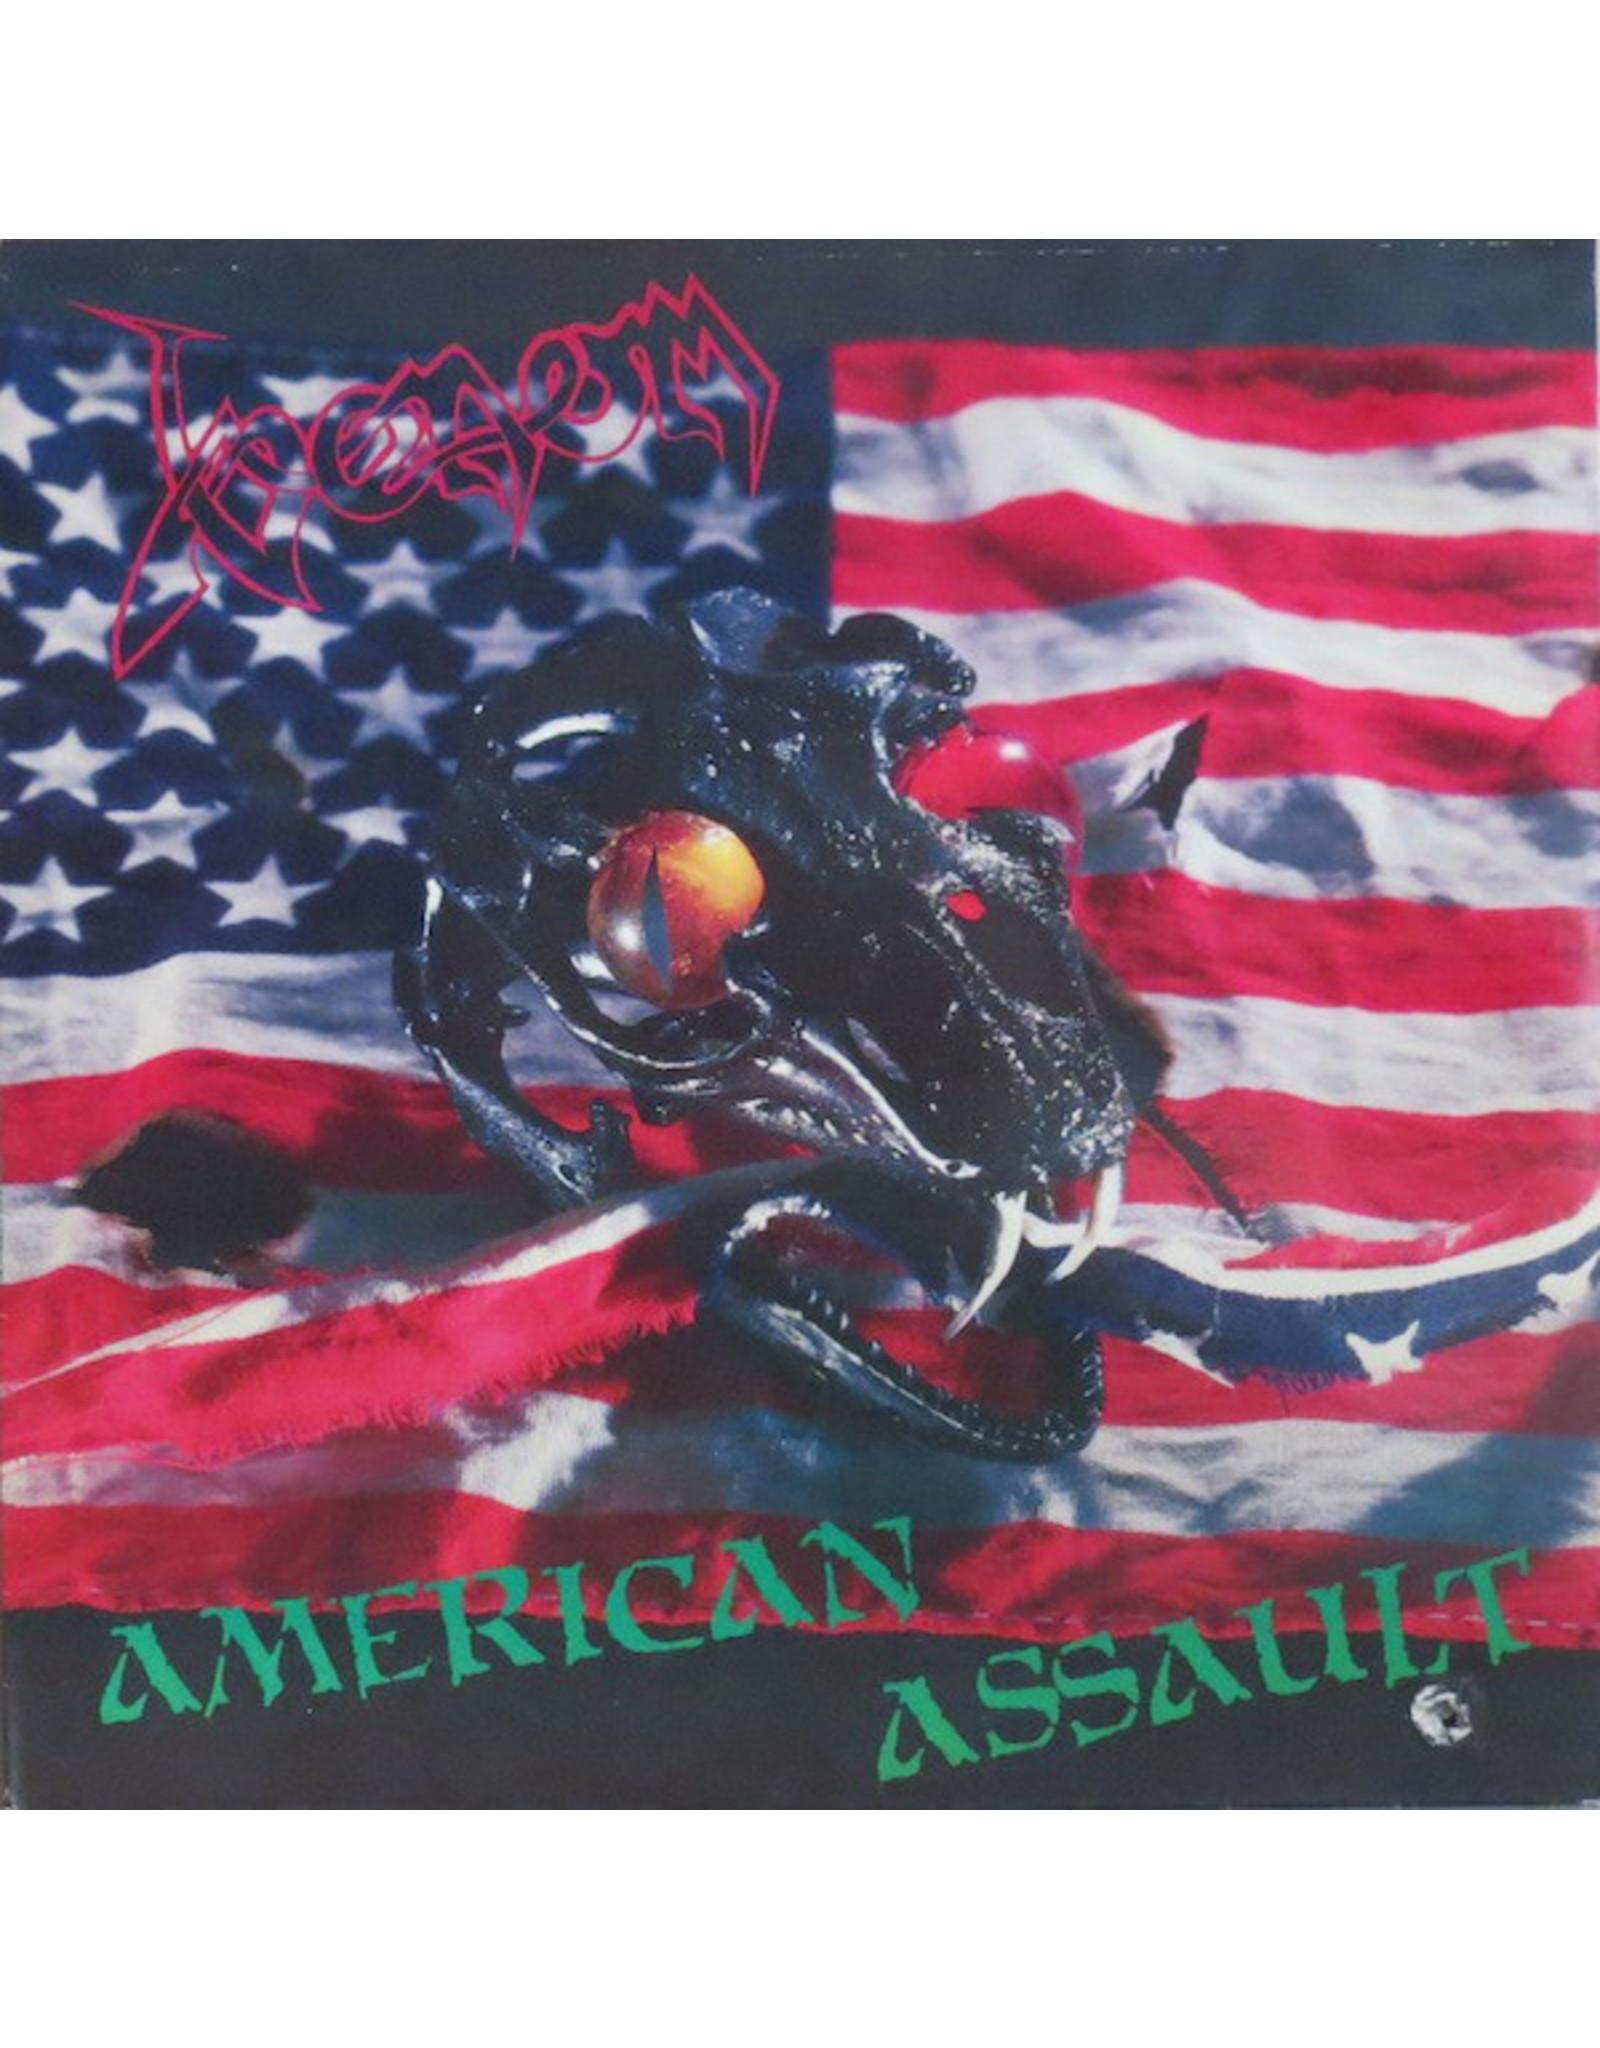 "New Vinyl Venom - American Assault EP 12"""